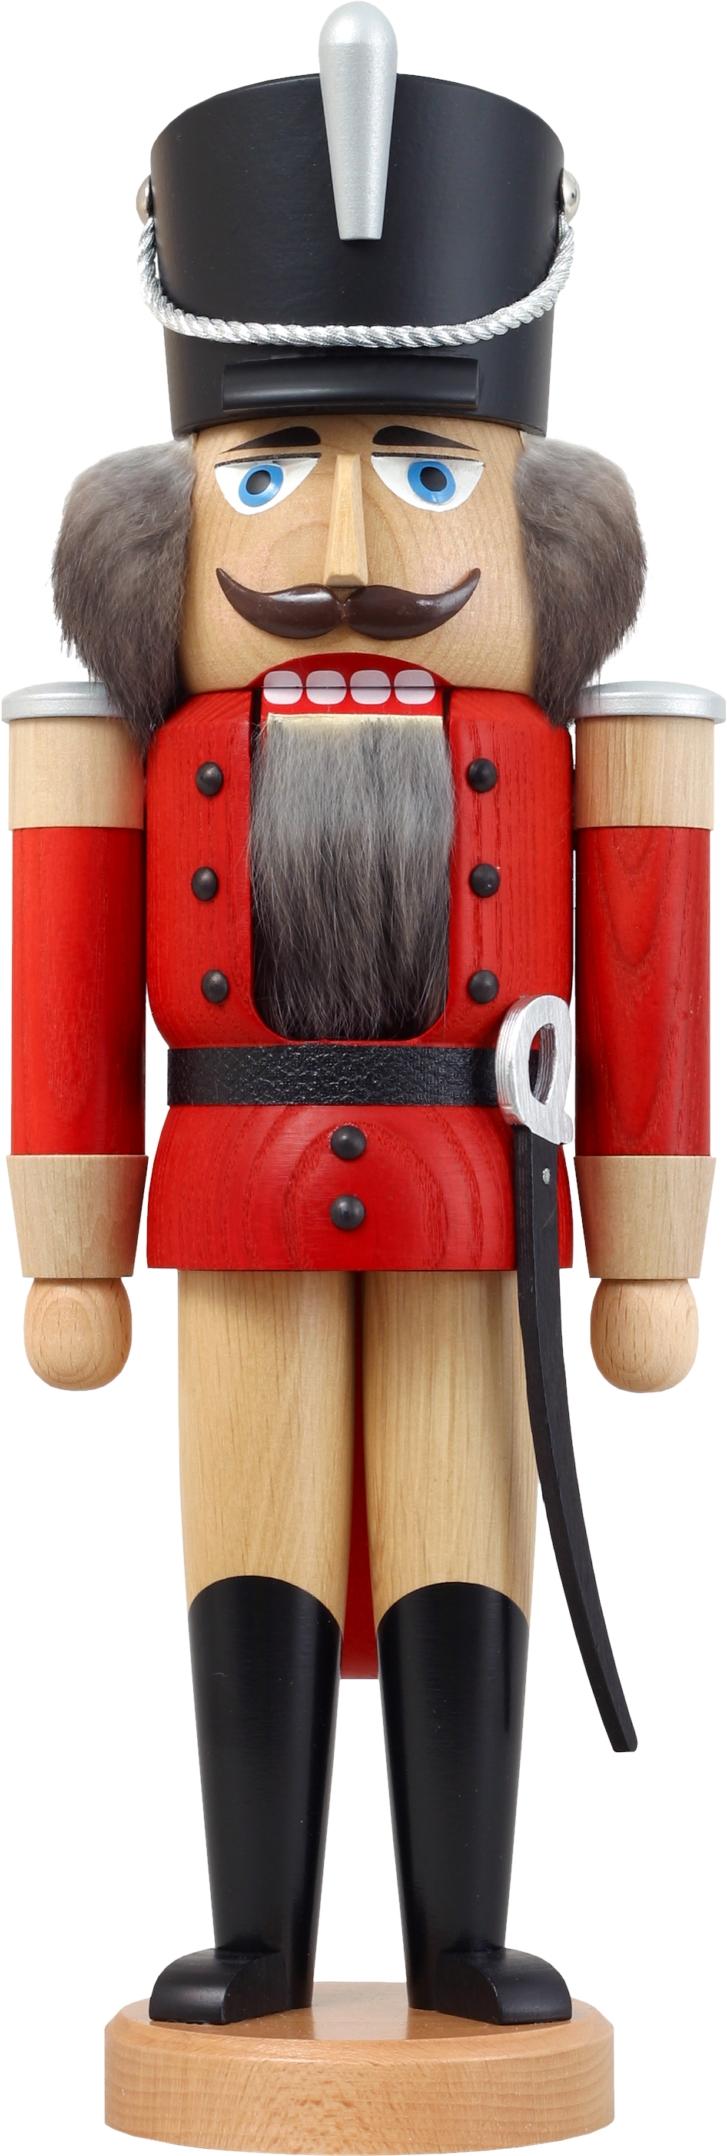 Nussknacker Husar aus Esche lasiert rot